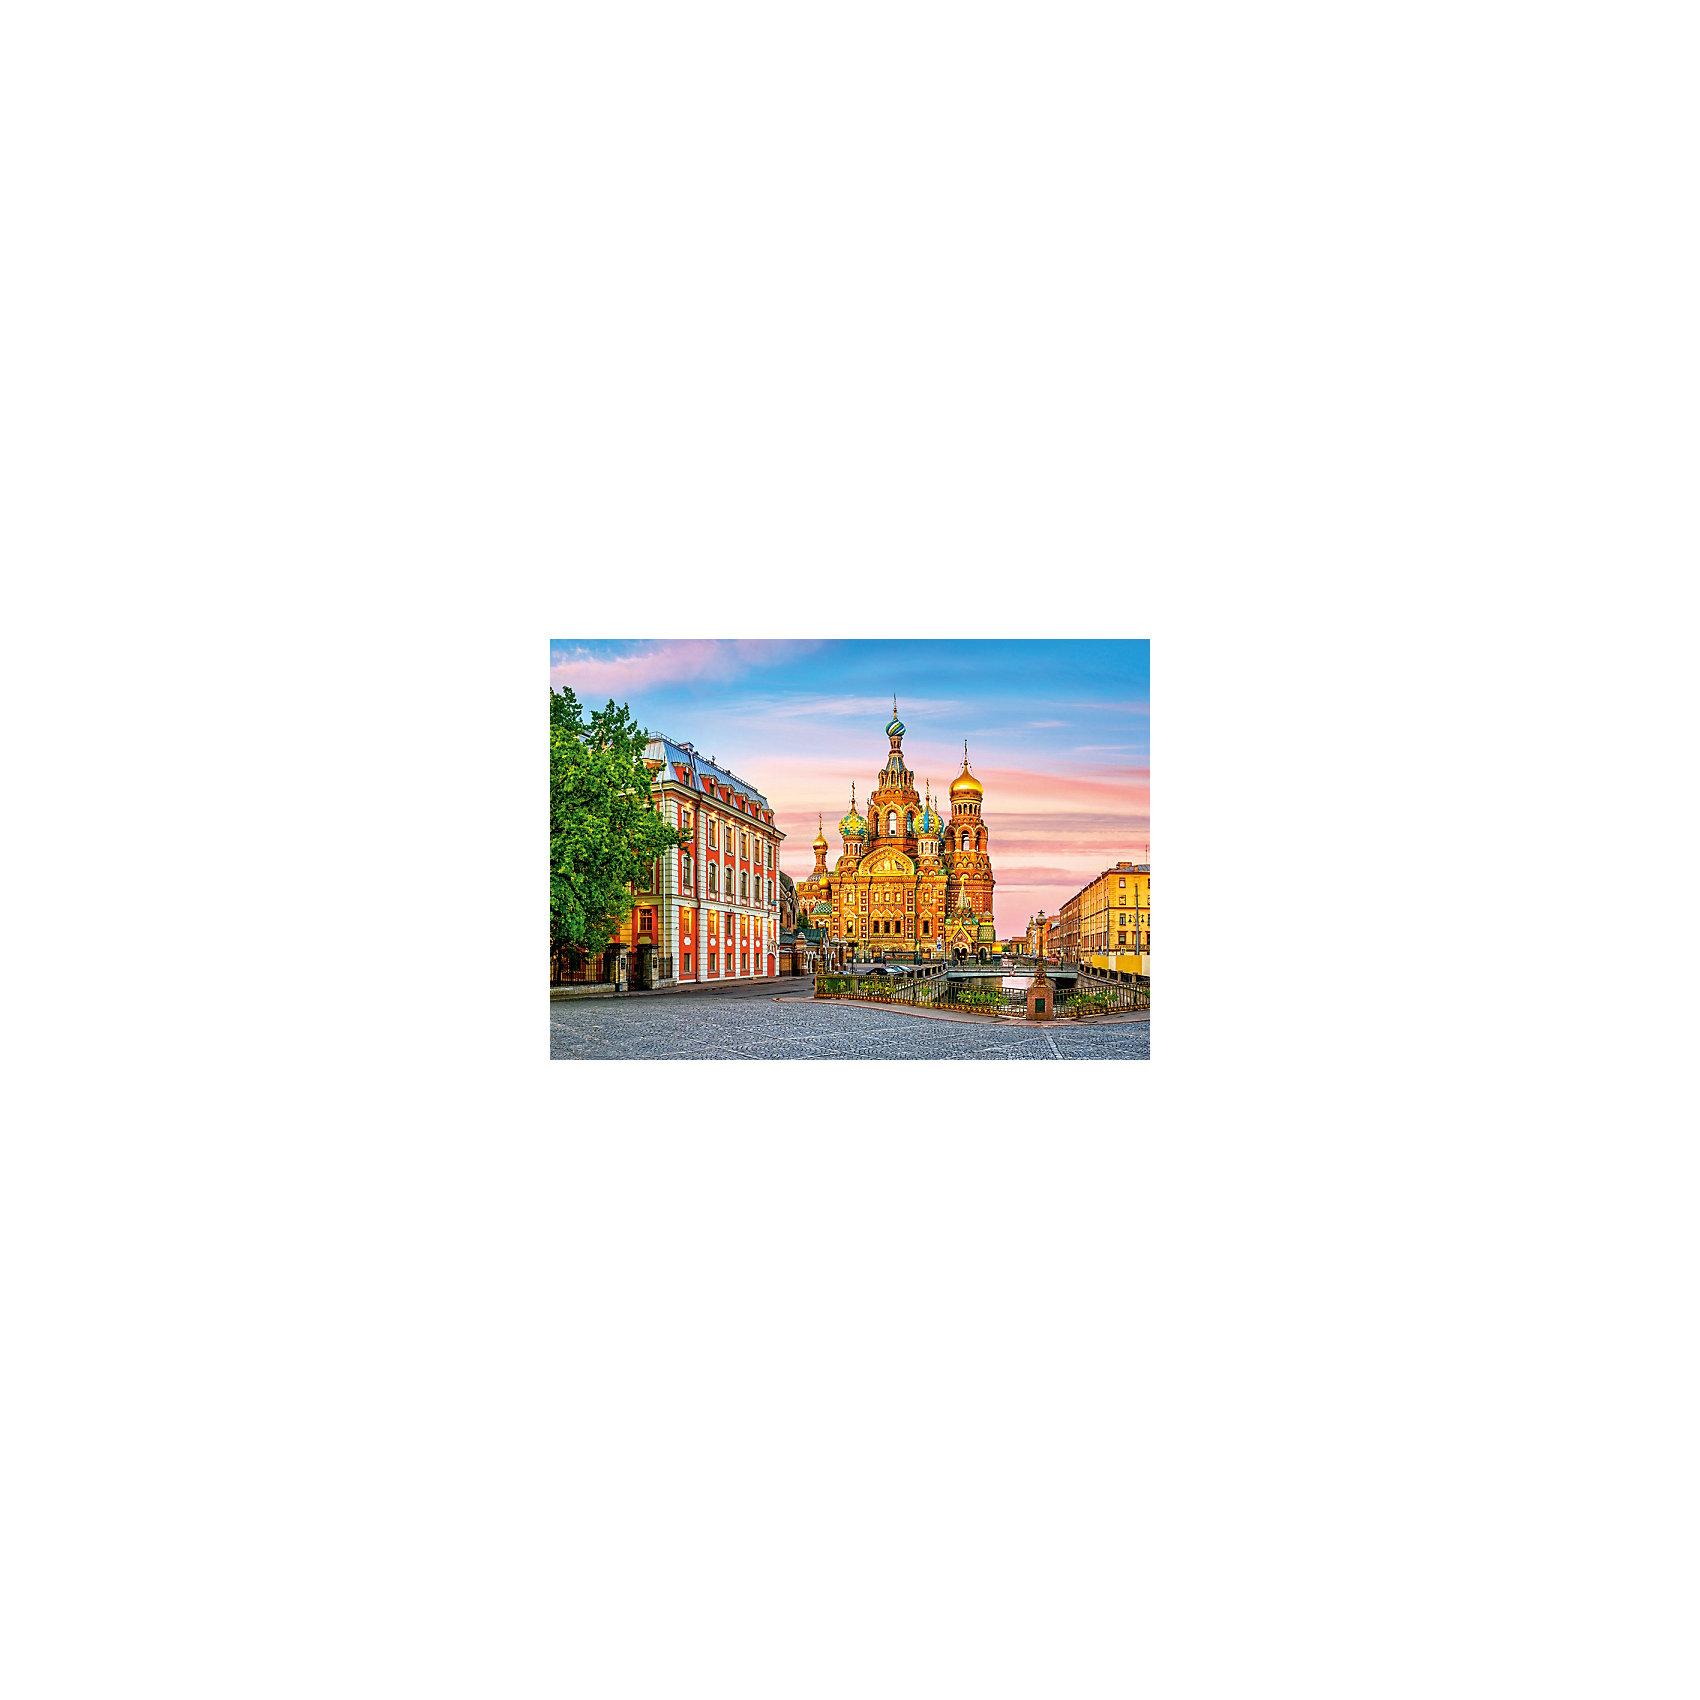 Castorland Пазл Храм в Санкт-Петербурге, 500 деталей, Castorland пазлы castorland пазл храм в санкт петербурге 500 элементов